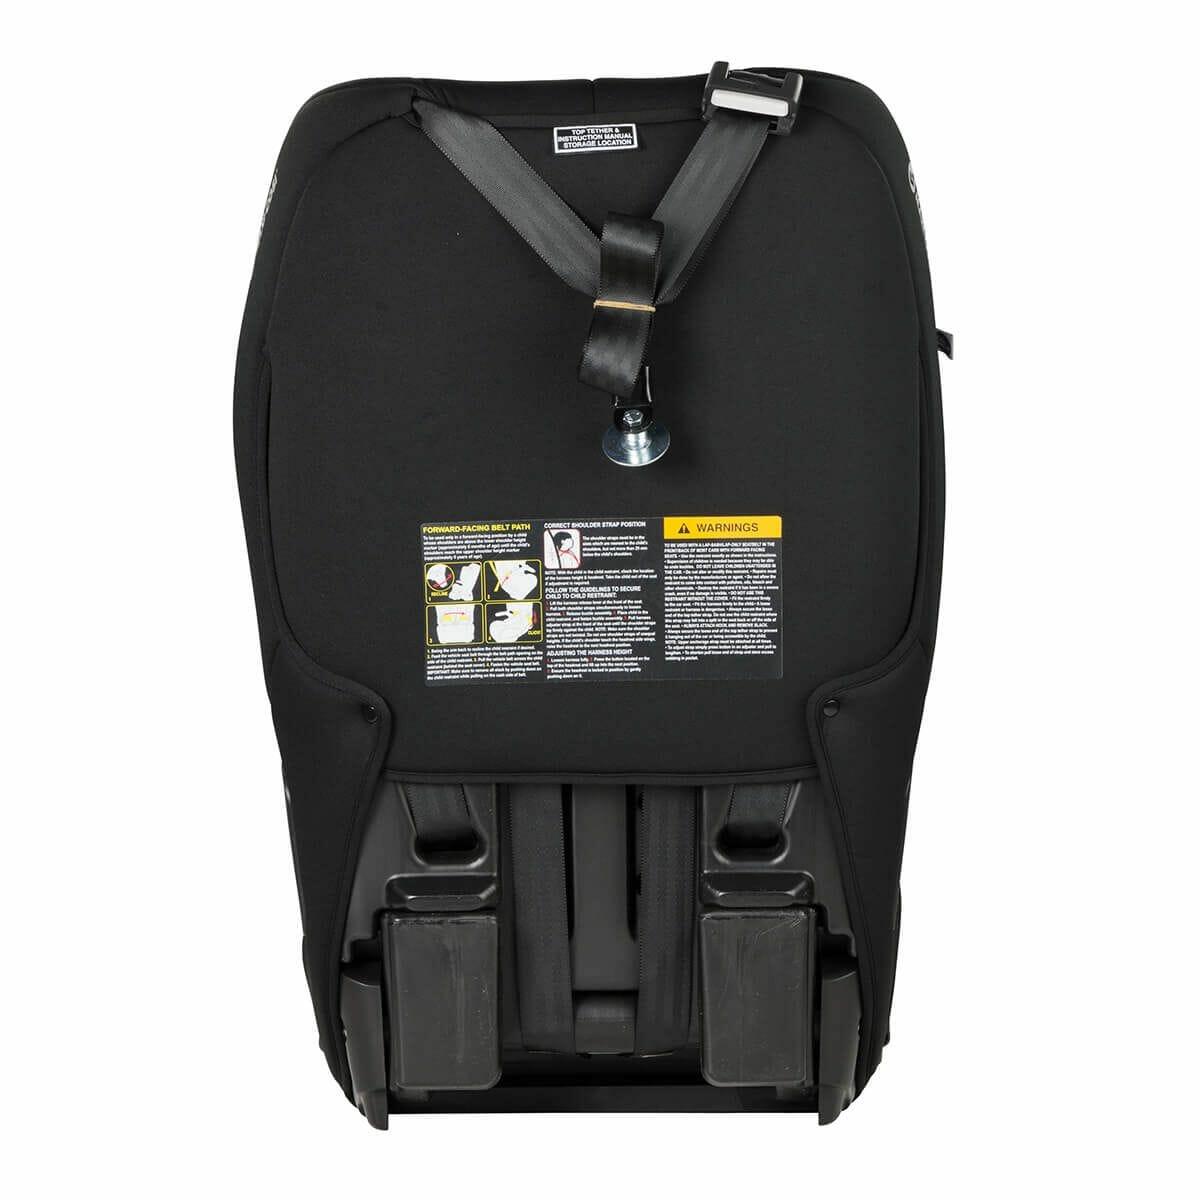 Maxi Cosi Luna Smart Pitch Black Vehicle Seat Protection